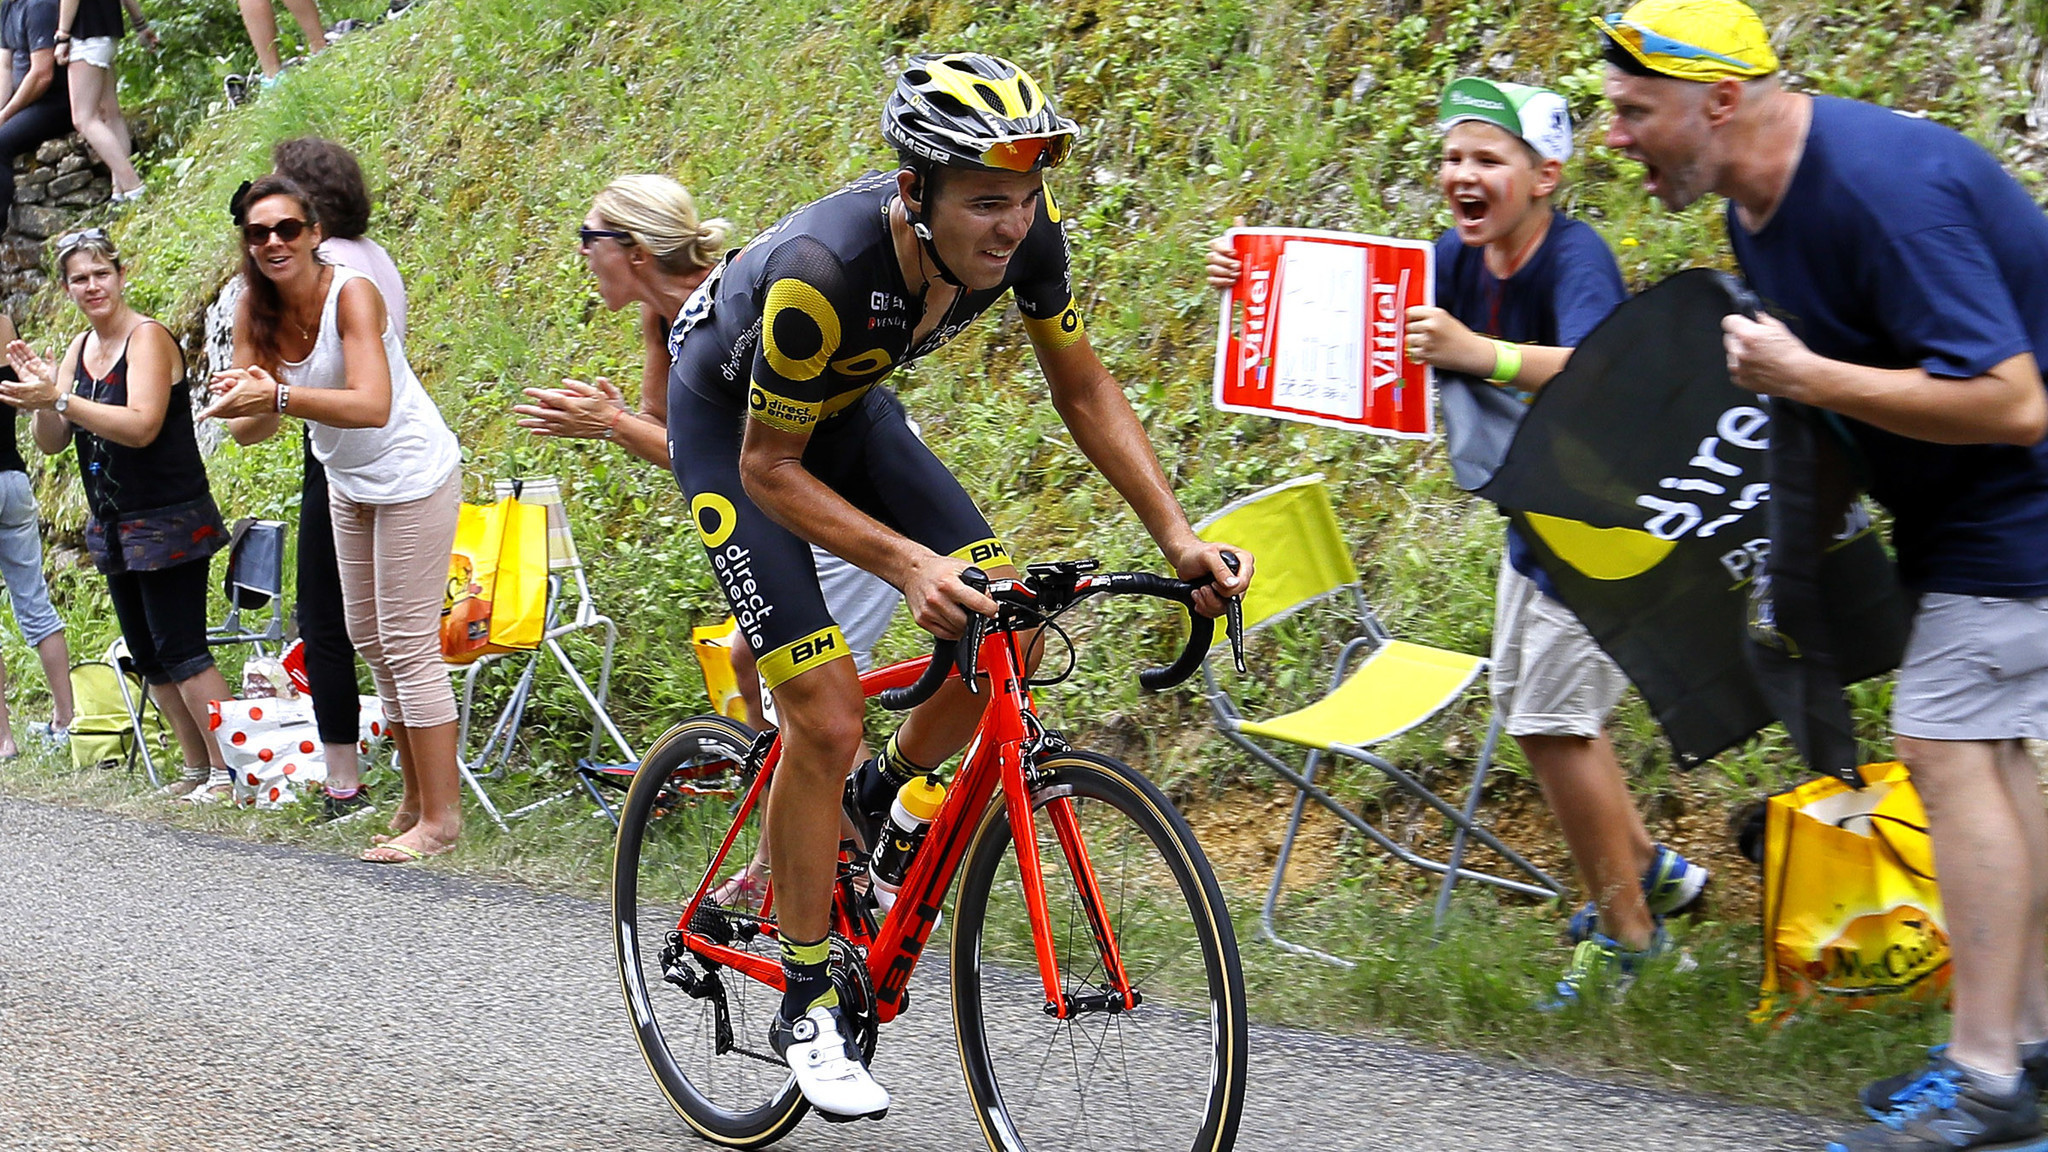 Lilian Calmejane Gets His First Tour De France Stage Win